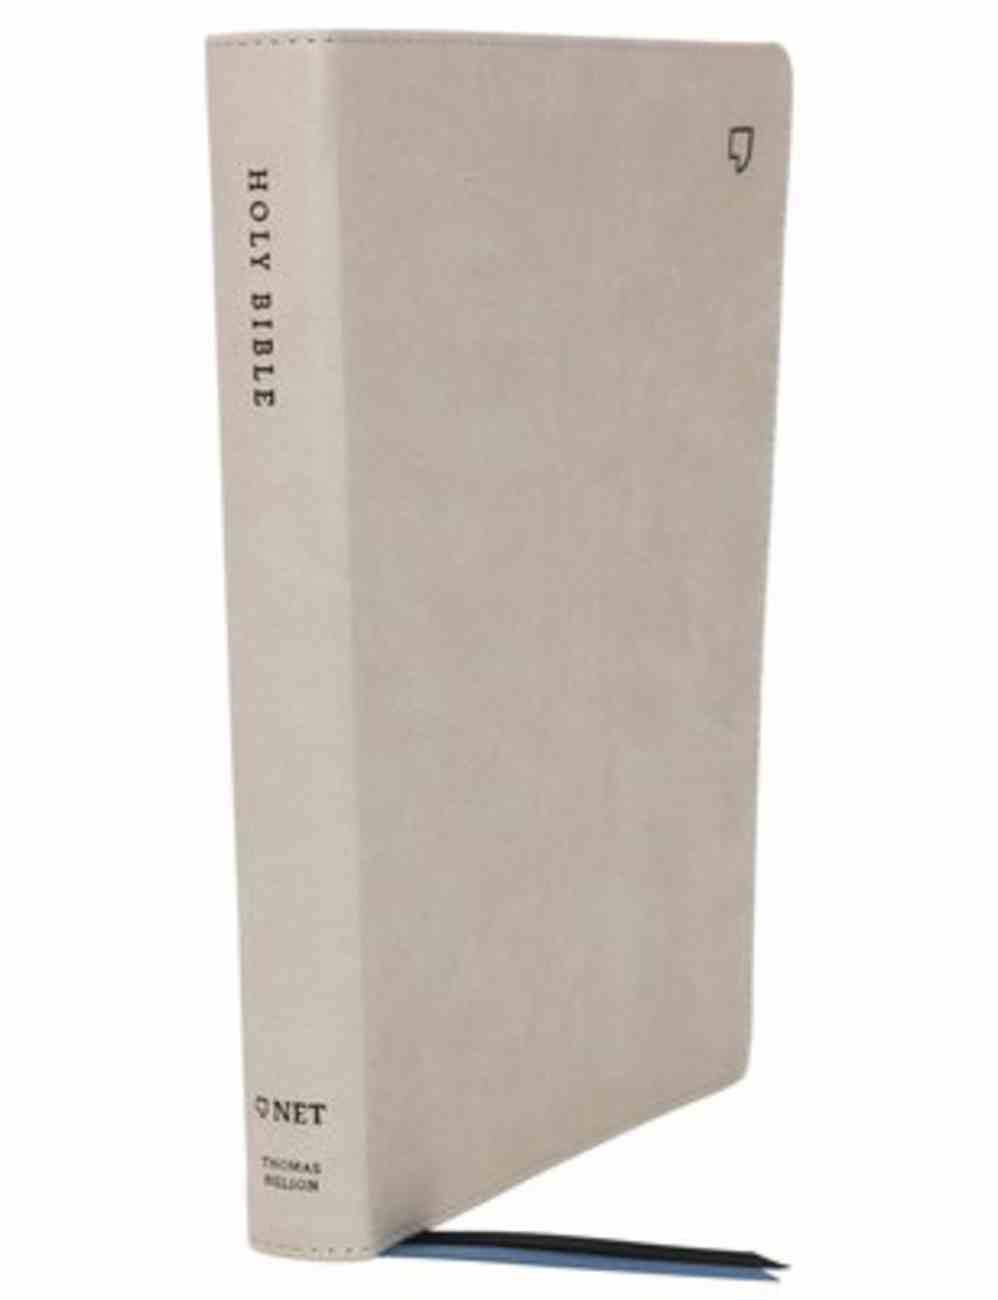 NET Bible Thinline Stone Indexed Premium Imitation Leather